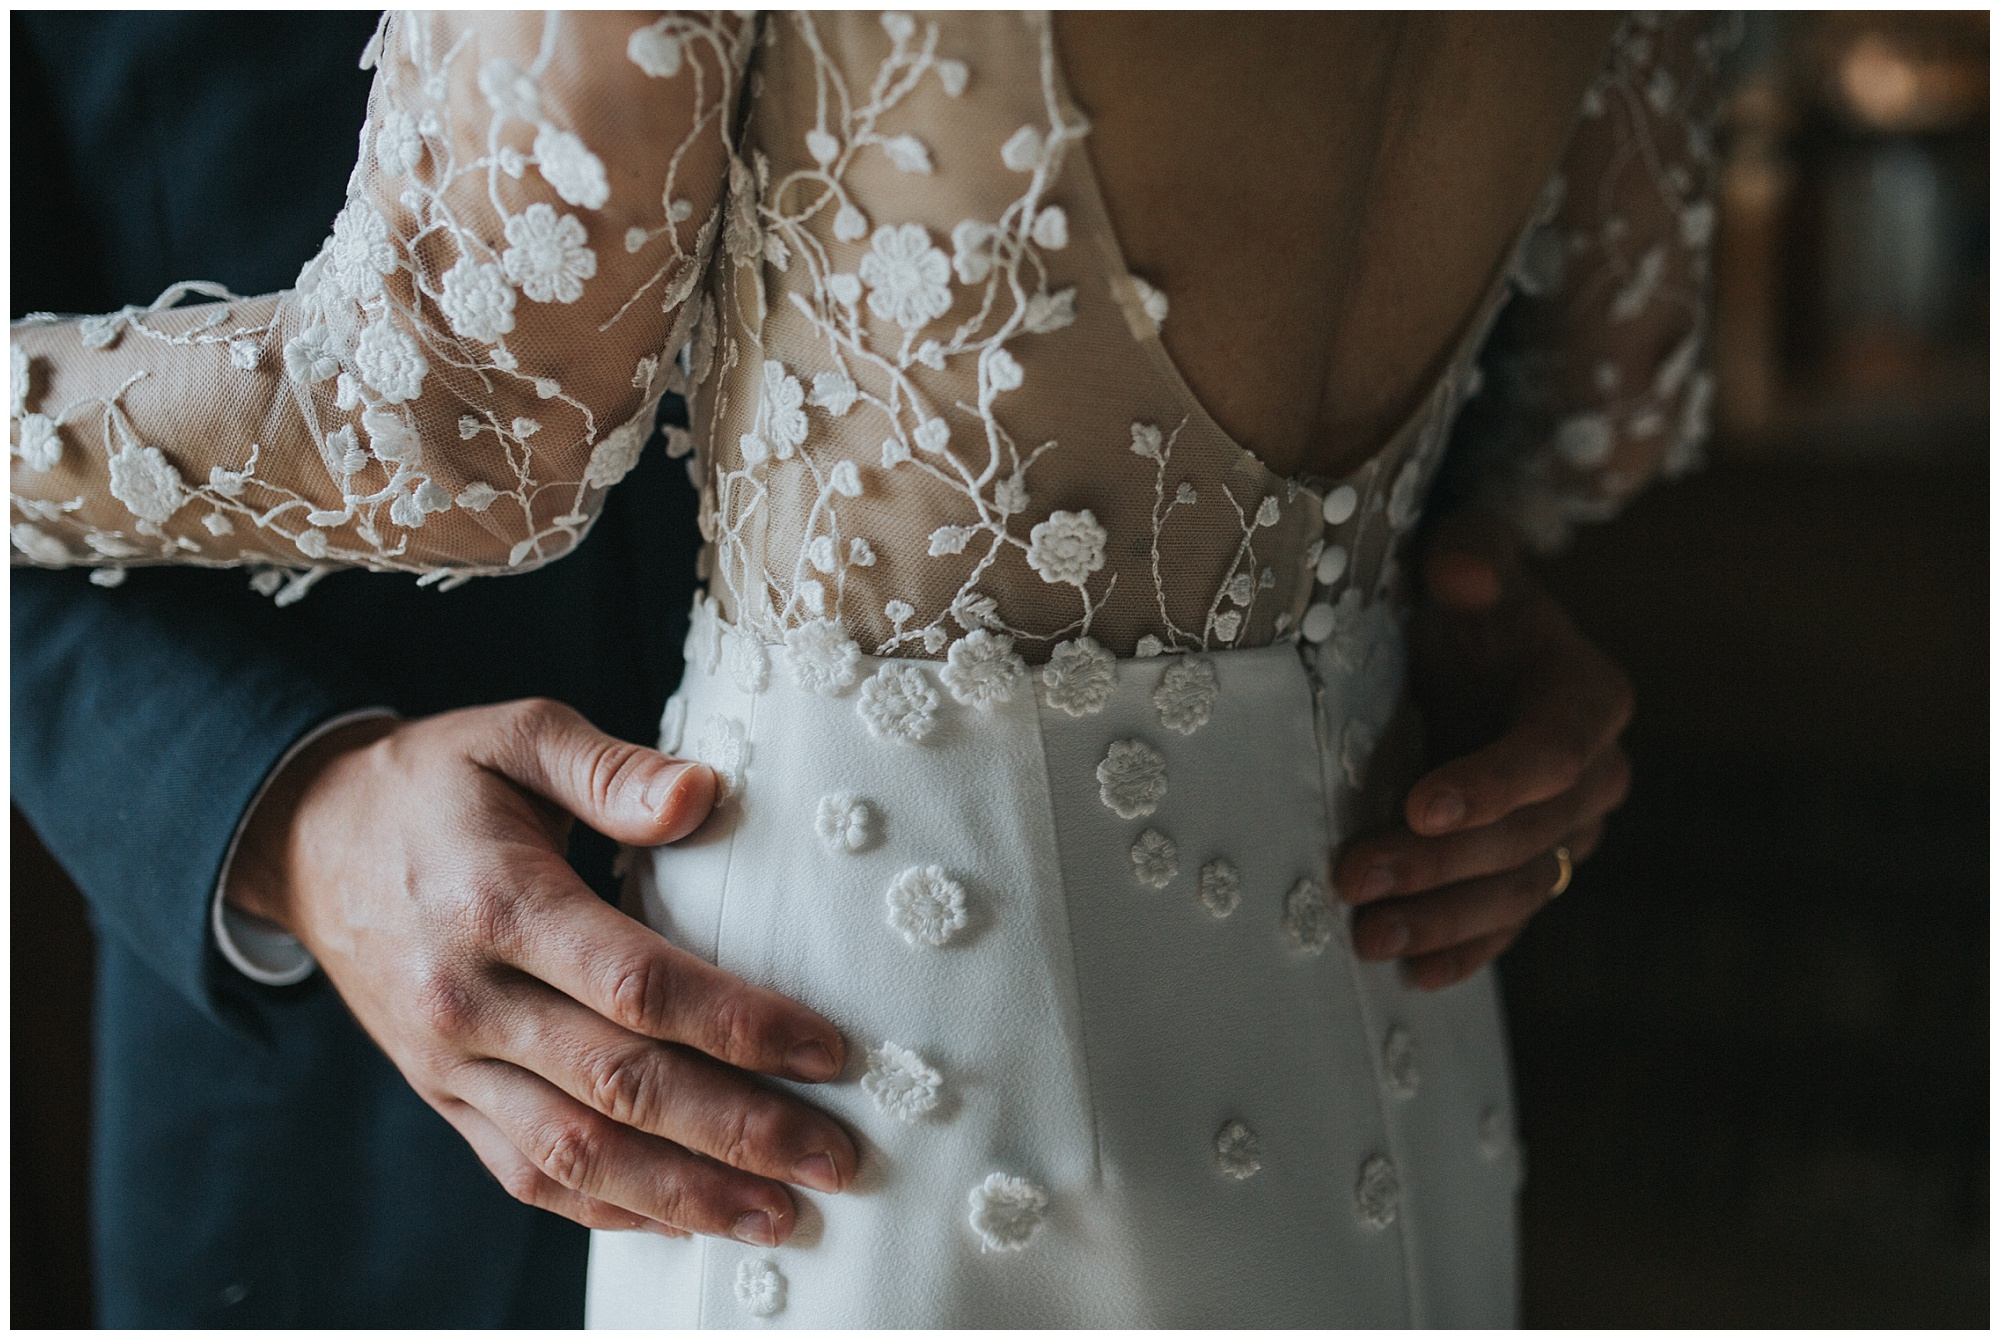 Kateryna-photos-photographer-reims-domaine-des-evis-mariage-normandie-rime-arodaky_0241.jpg